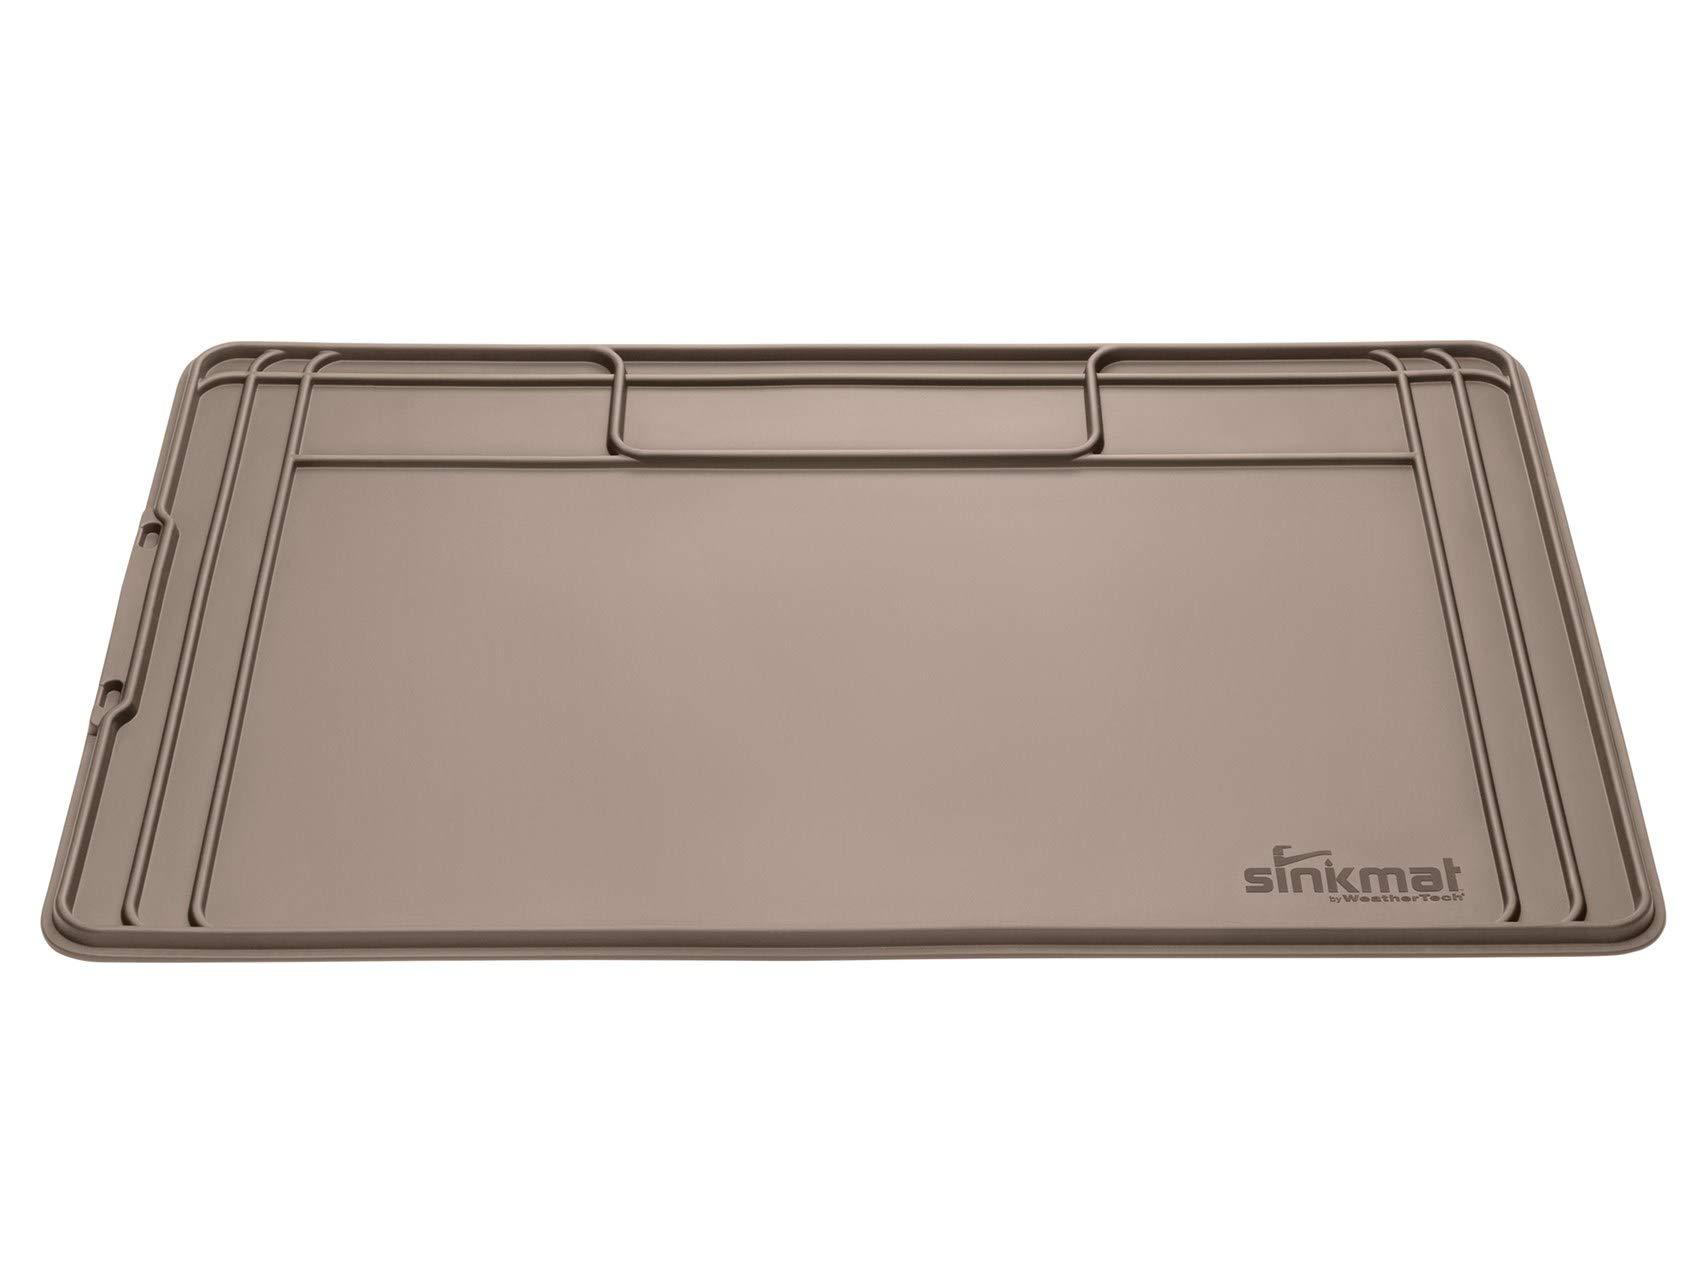 WeatherTech SinkMat - Under the Sink Cabinet Protection Mat - Tan